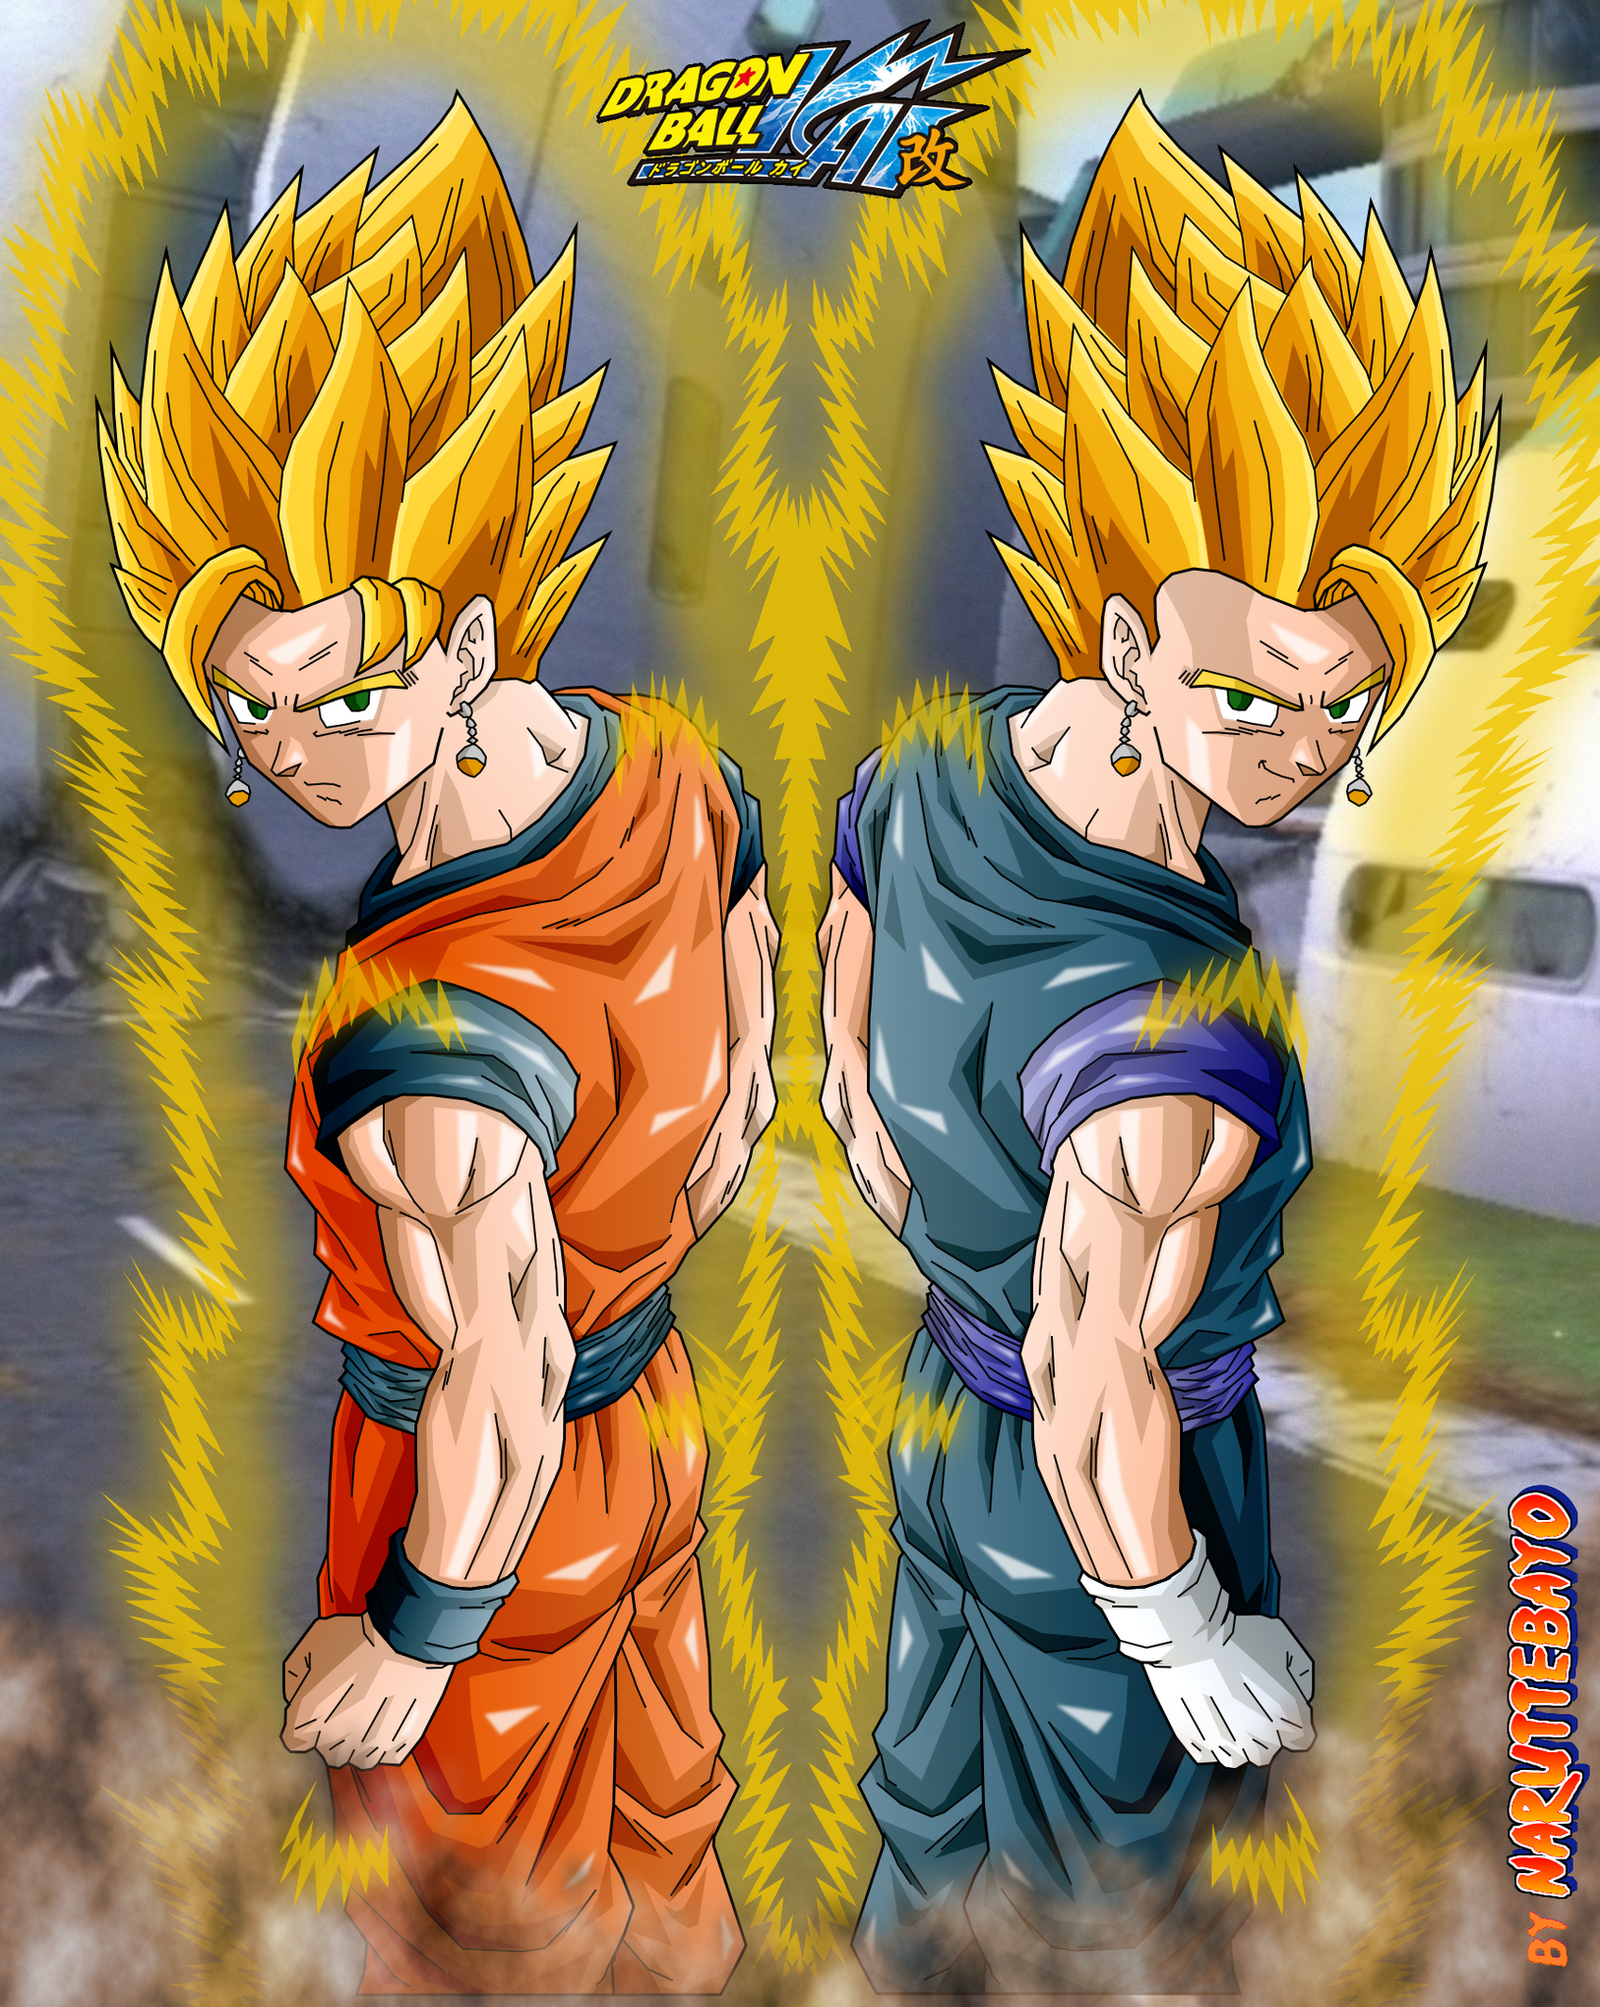 gokhan vegehan double fusion - back pose ssj by Naruttebayo67Goku And Gohan Fusion Ssj4